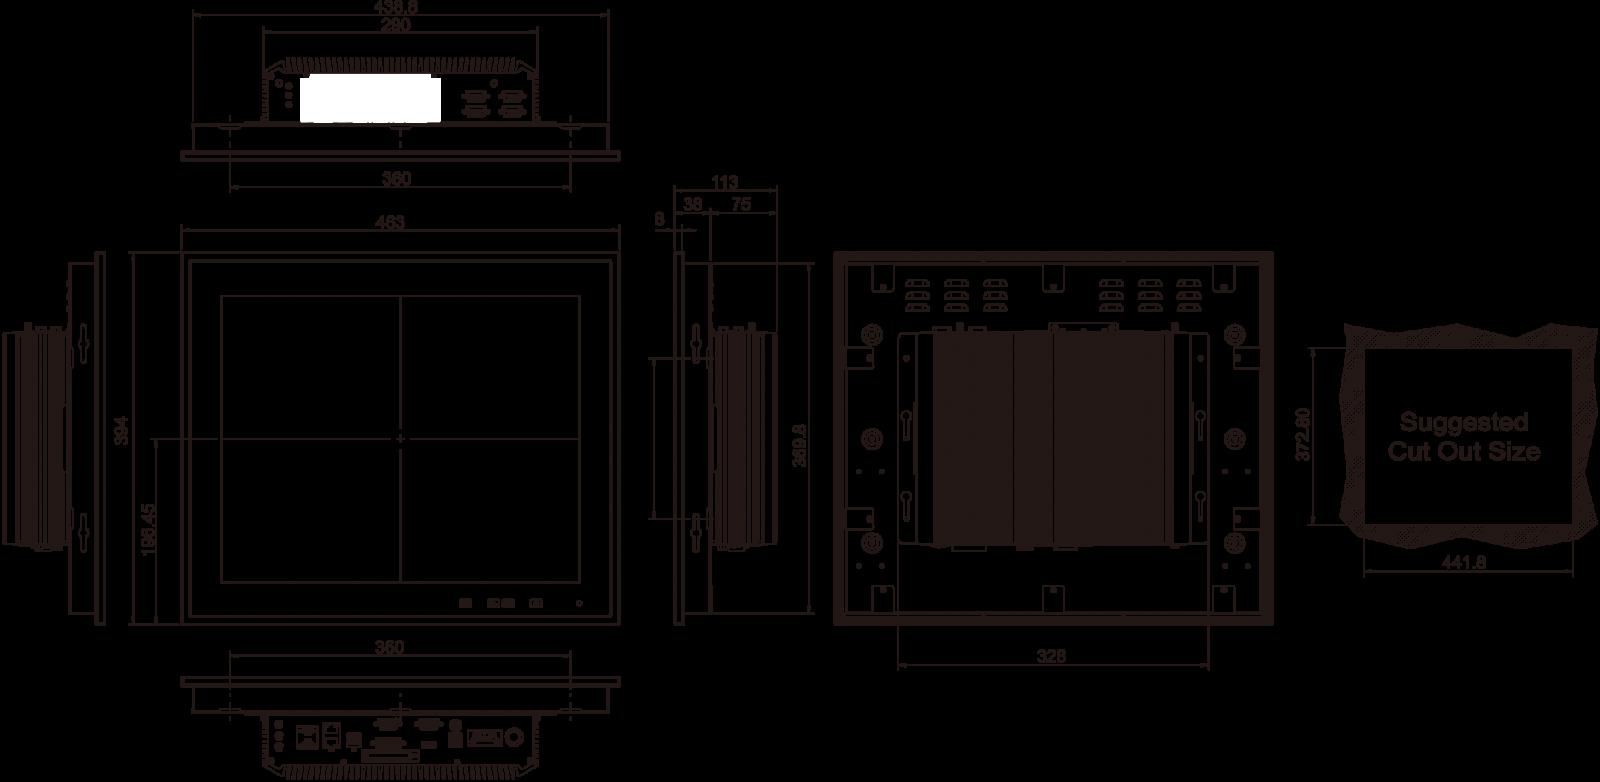 marine-panel-pc dimensions